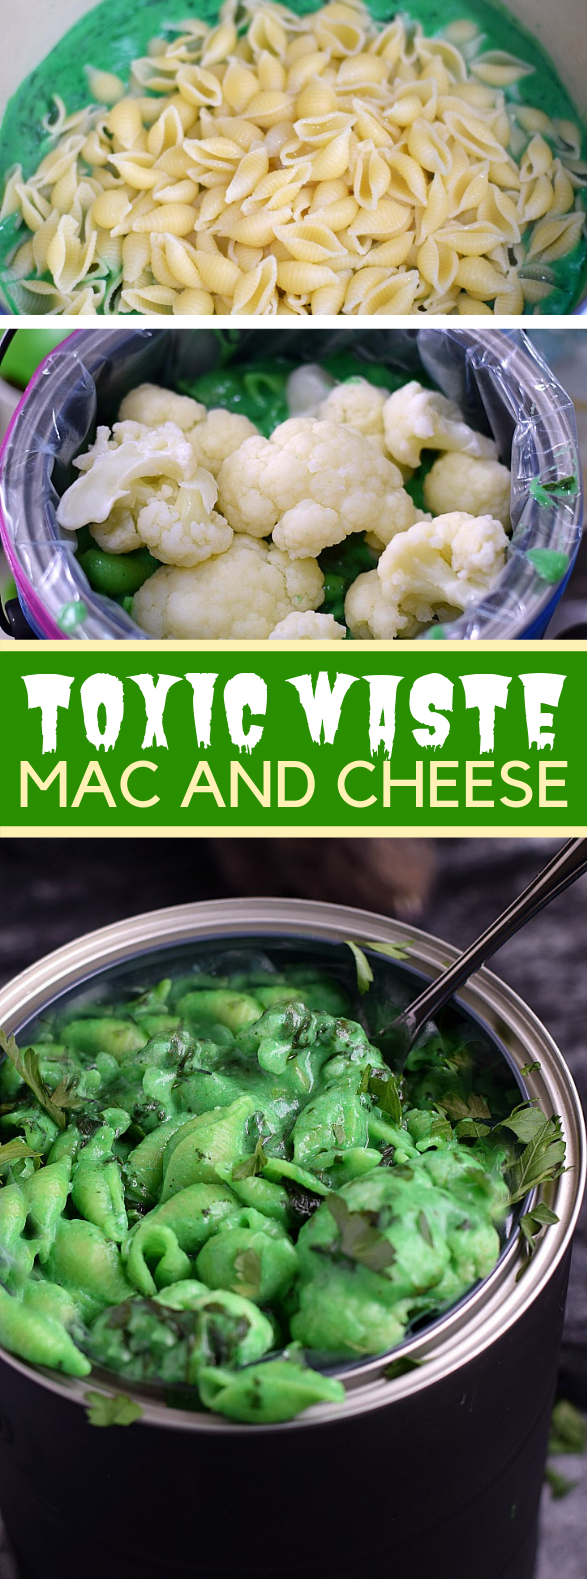 TOXIC WASTE MAC AND CHEESE #vegetarian #halloween